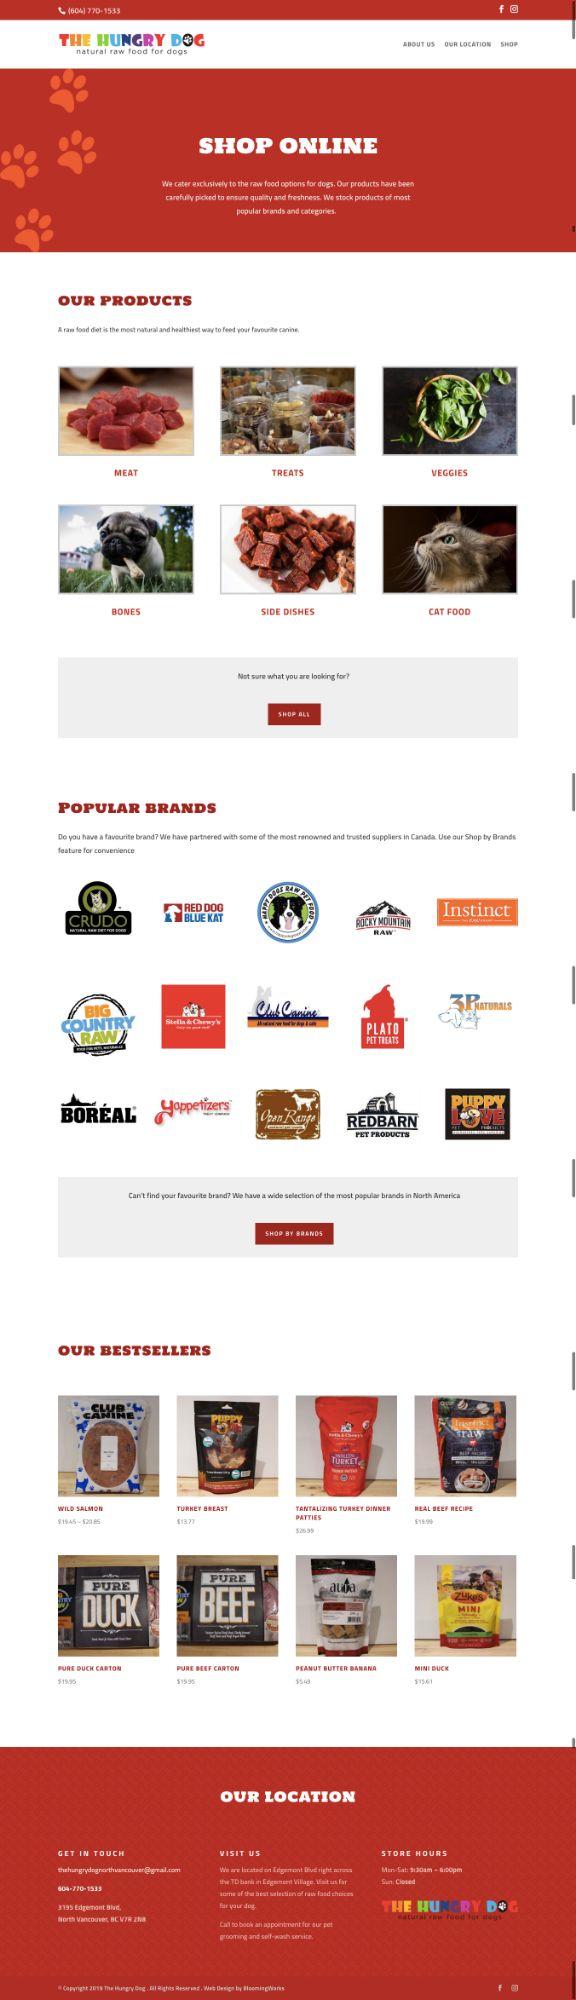 Web design for online pet food store